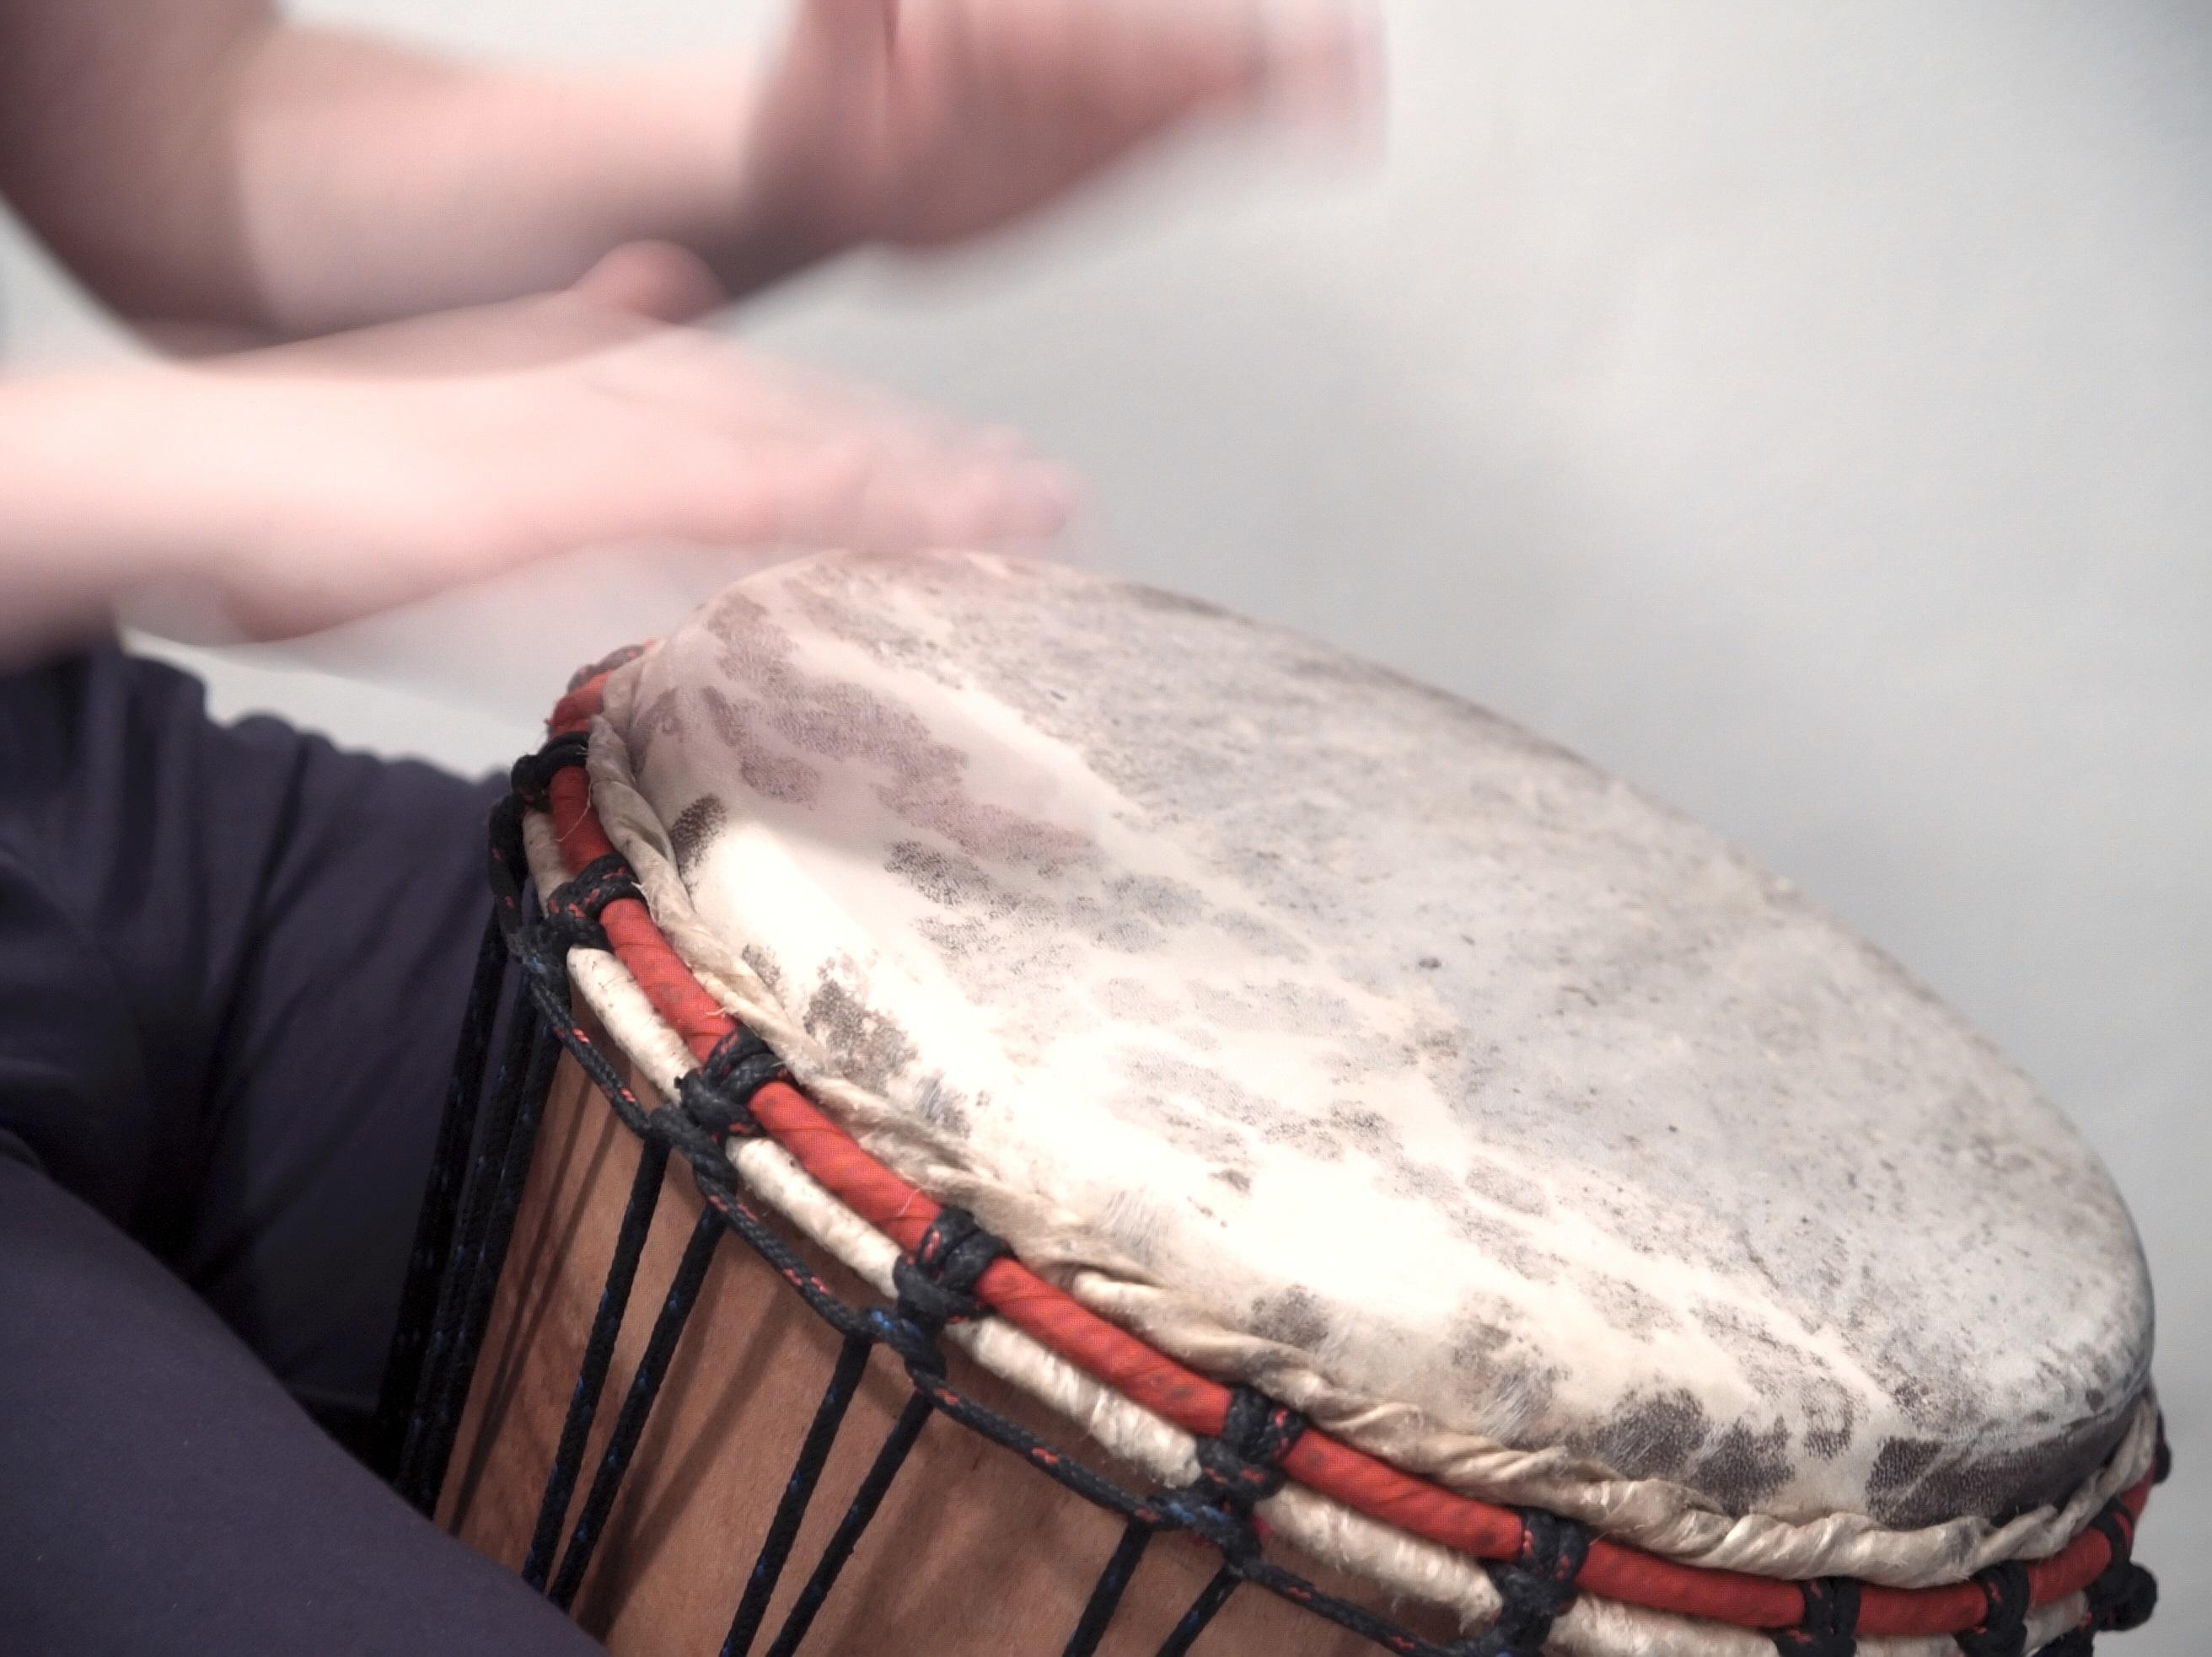 f96cc5009baf95efe27a_Drumming_Classes_at_WMC.jpg